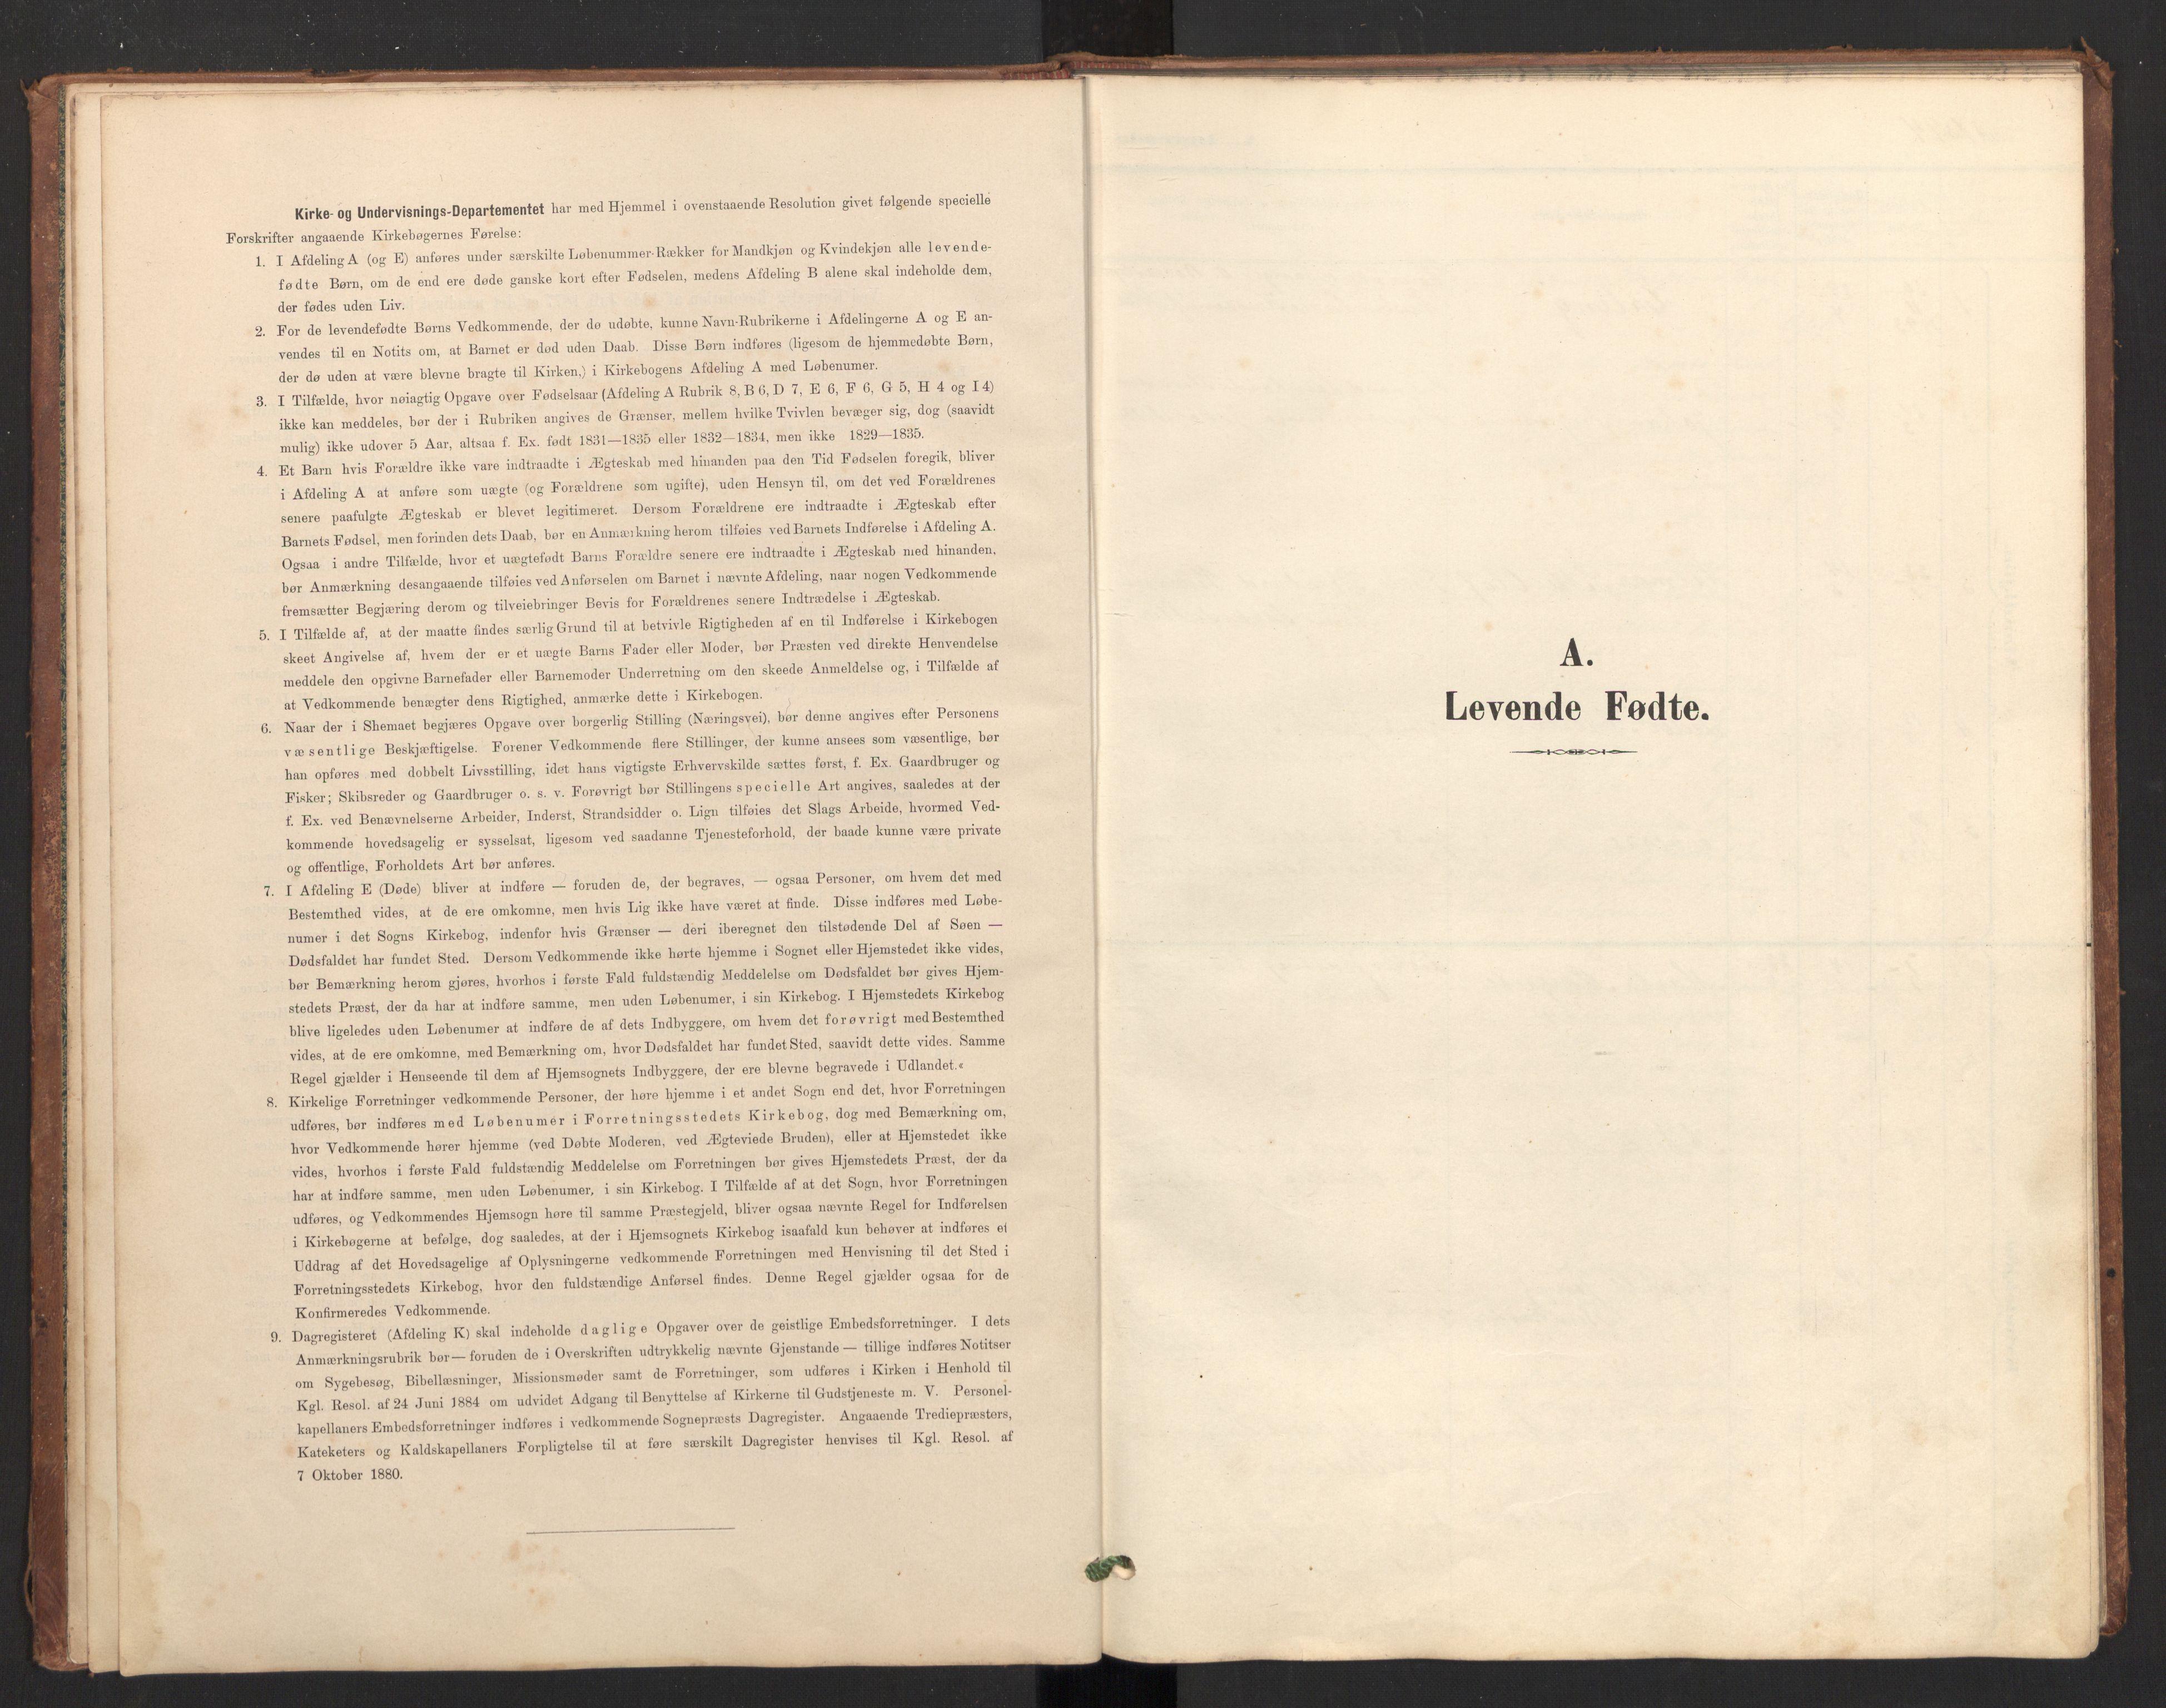 SAT, Ministerialprotokoller, klokkerbøker og fødselsregistre - Nordland, 804/L0087: Ministerialbok nr. 804A08, 1894-1907